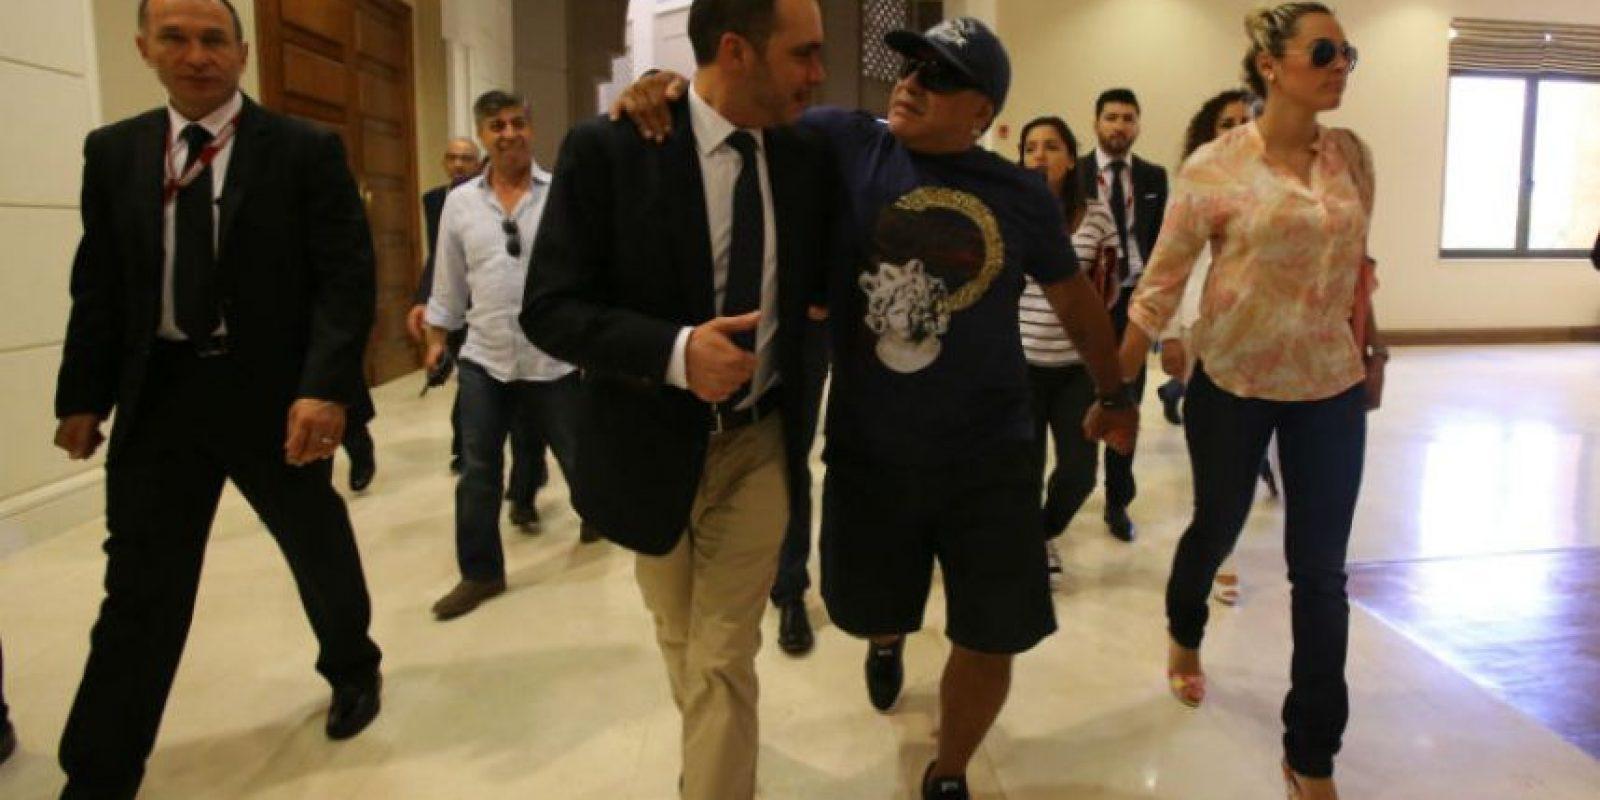 Maradona apoya la candidatura del Príncipe Ali Bin Al Hussein, candidato opositor de Blatter Foto:Getty Images